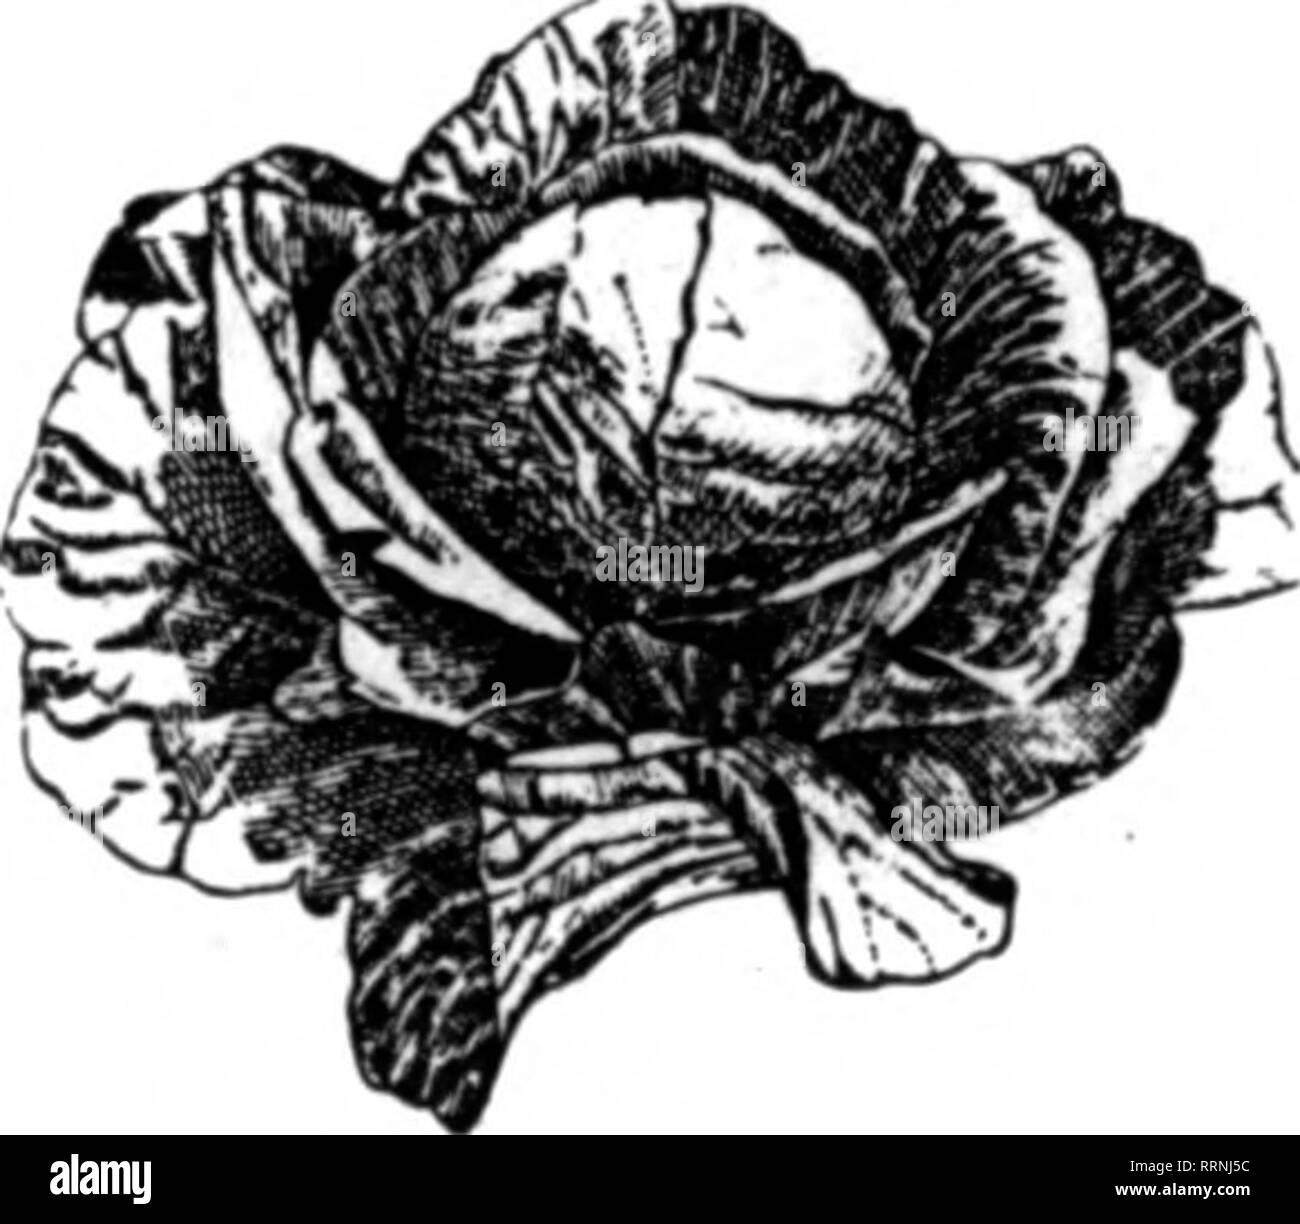 Shenandoah Black and White Stock Photos & Images - Page 3 - Alamy